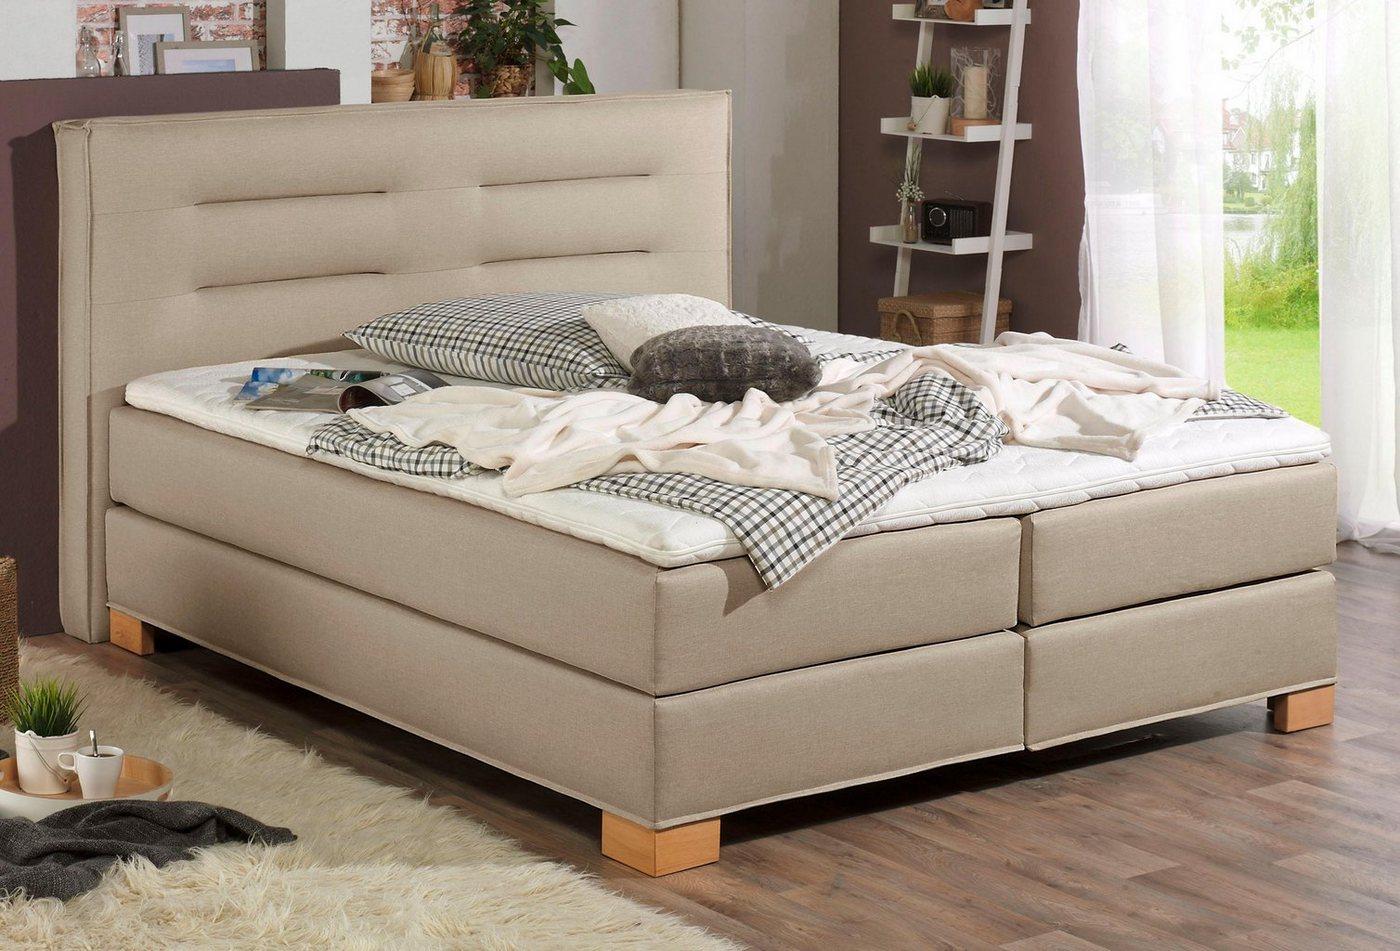 home affaire boxspringbett finley incl kaltschaumtopper 5 breiten 2 h rtegrade 3. Black Bedroom Furniture Sets. Home Design Ideas